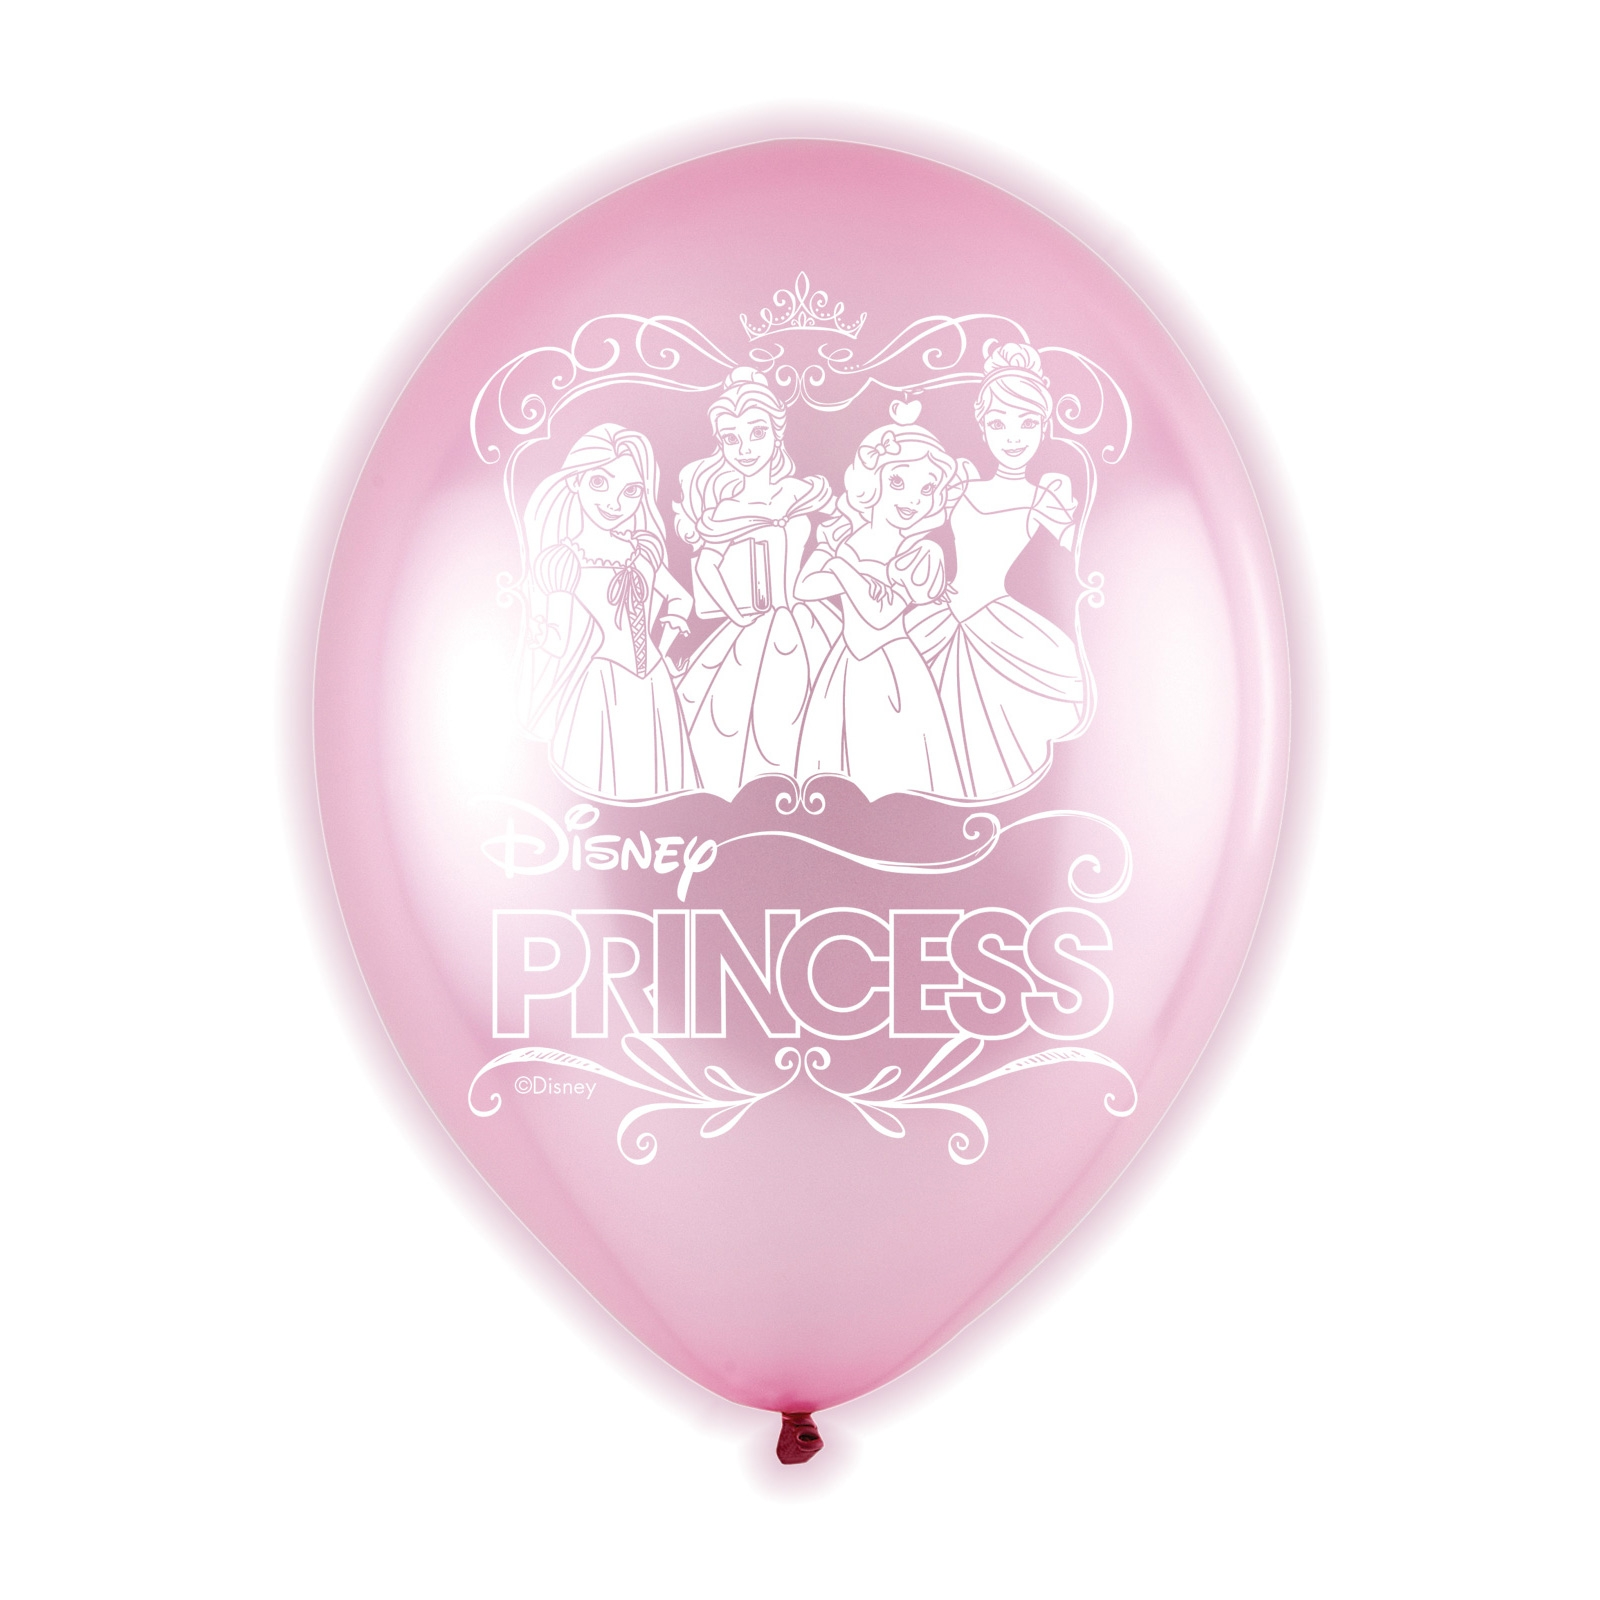 Disney Princess Light Up Balloons 5 Pack